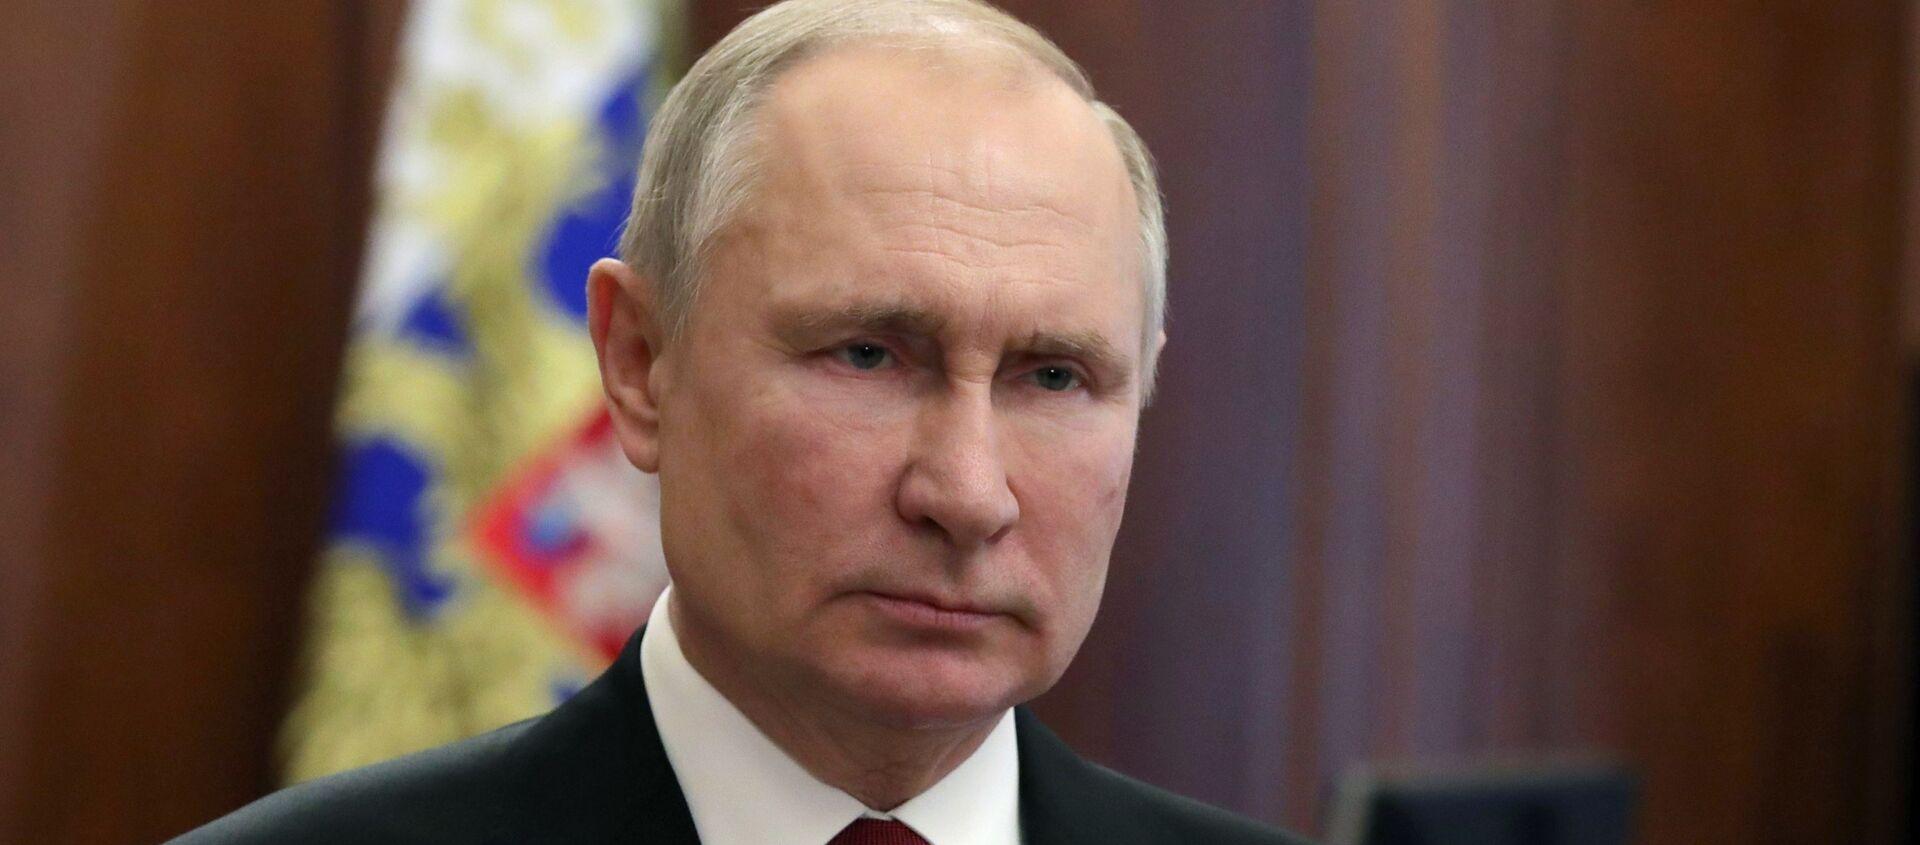 Prezydent Rosji Władimir Putin. - Sputnik Polska, 1920, 01.03.2021